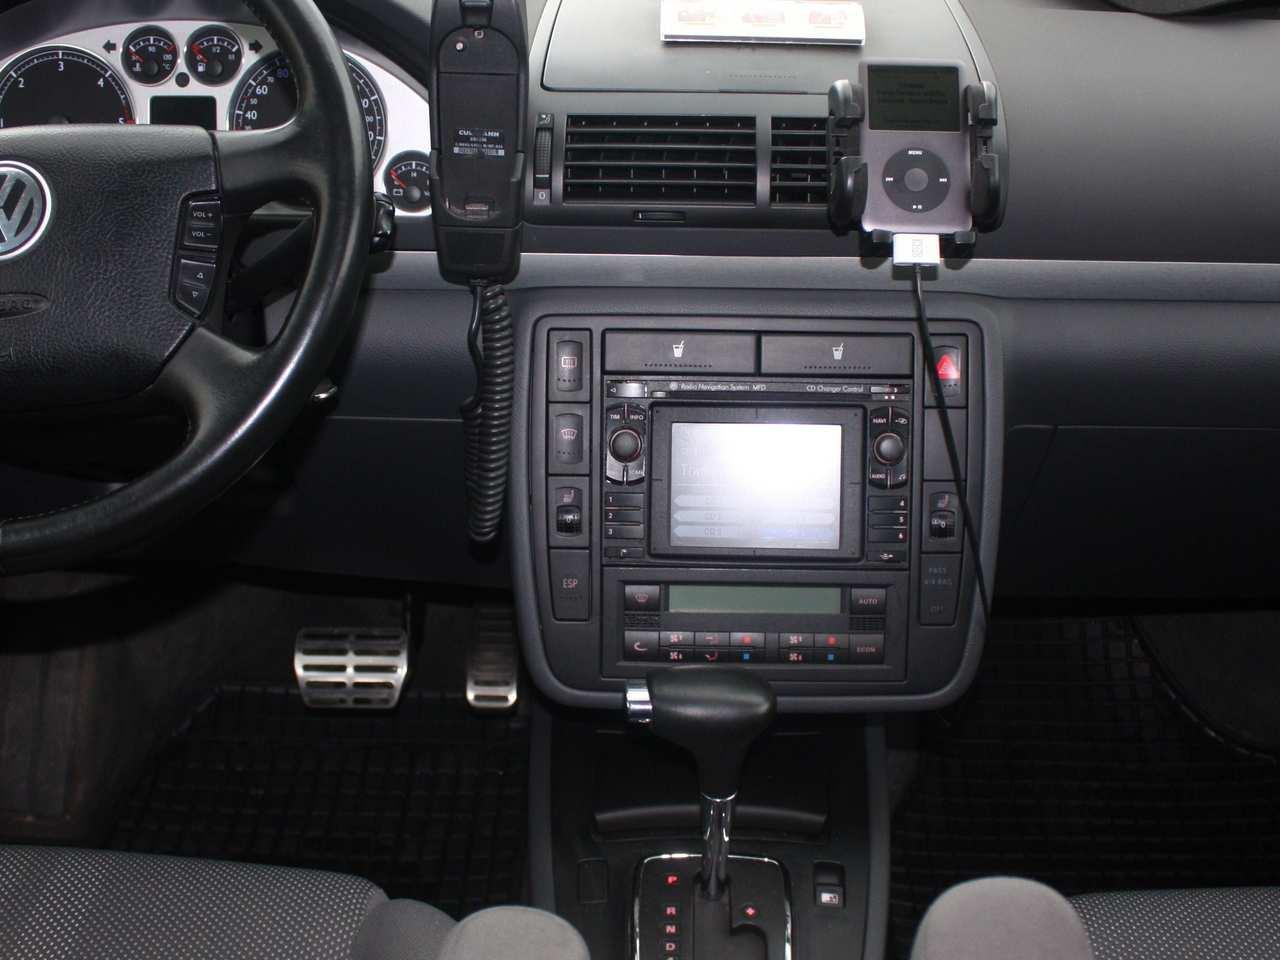 Volkswagen Sharan (2005)